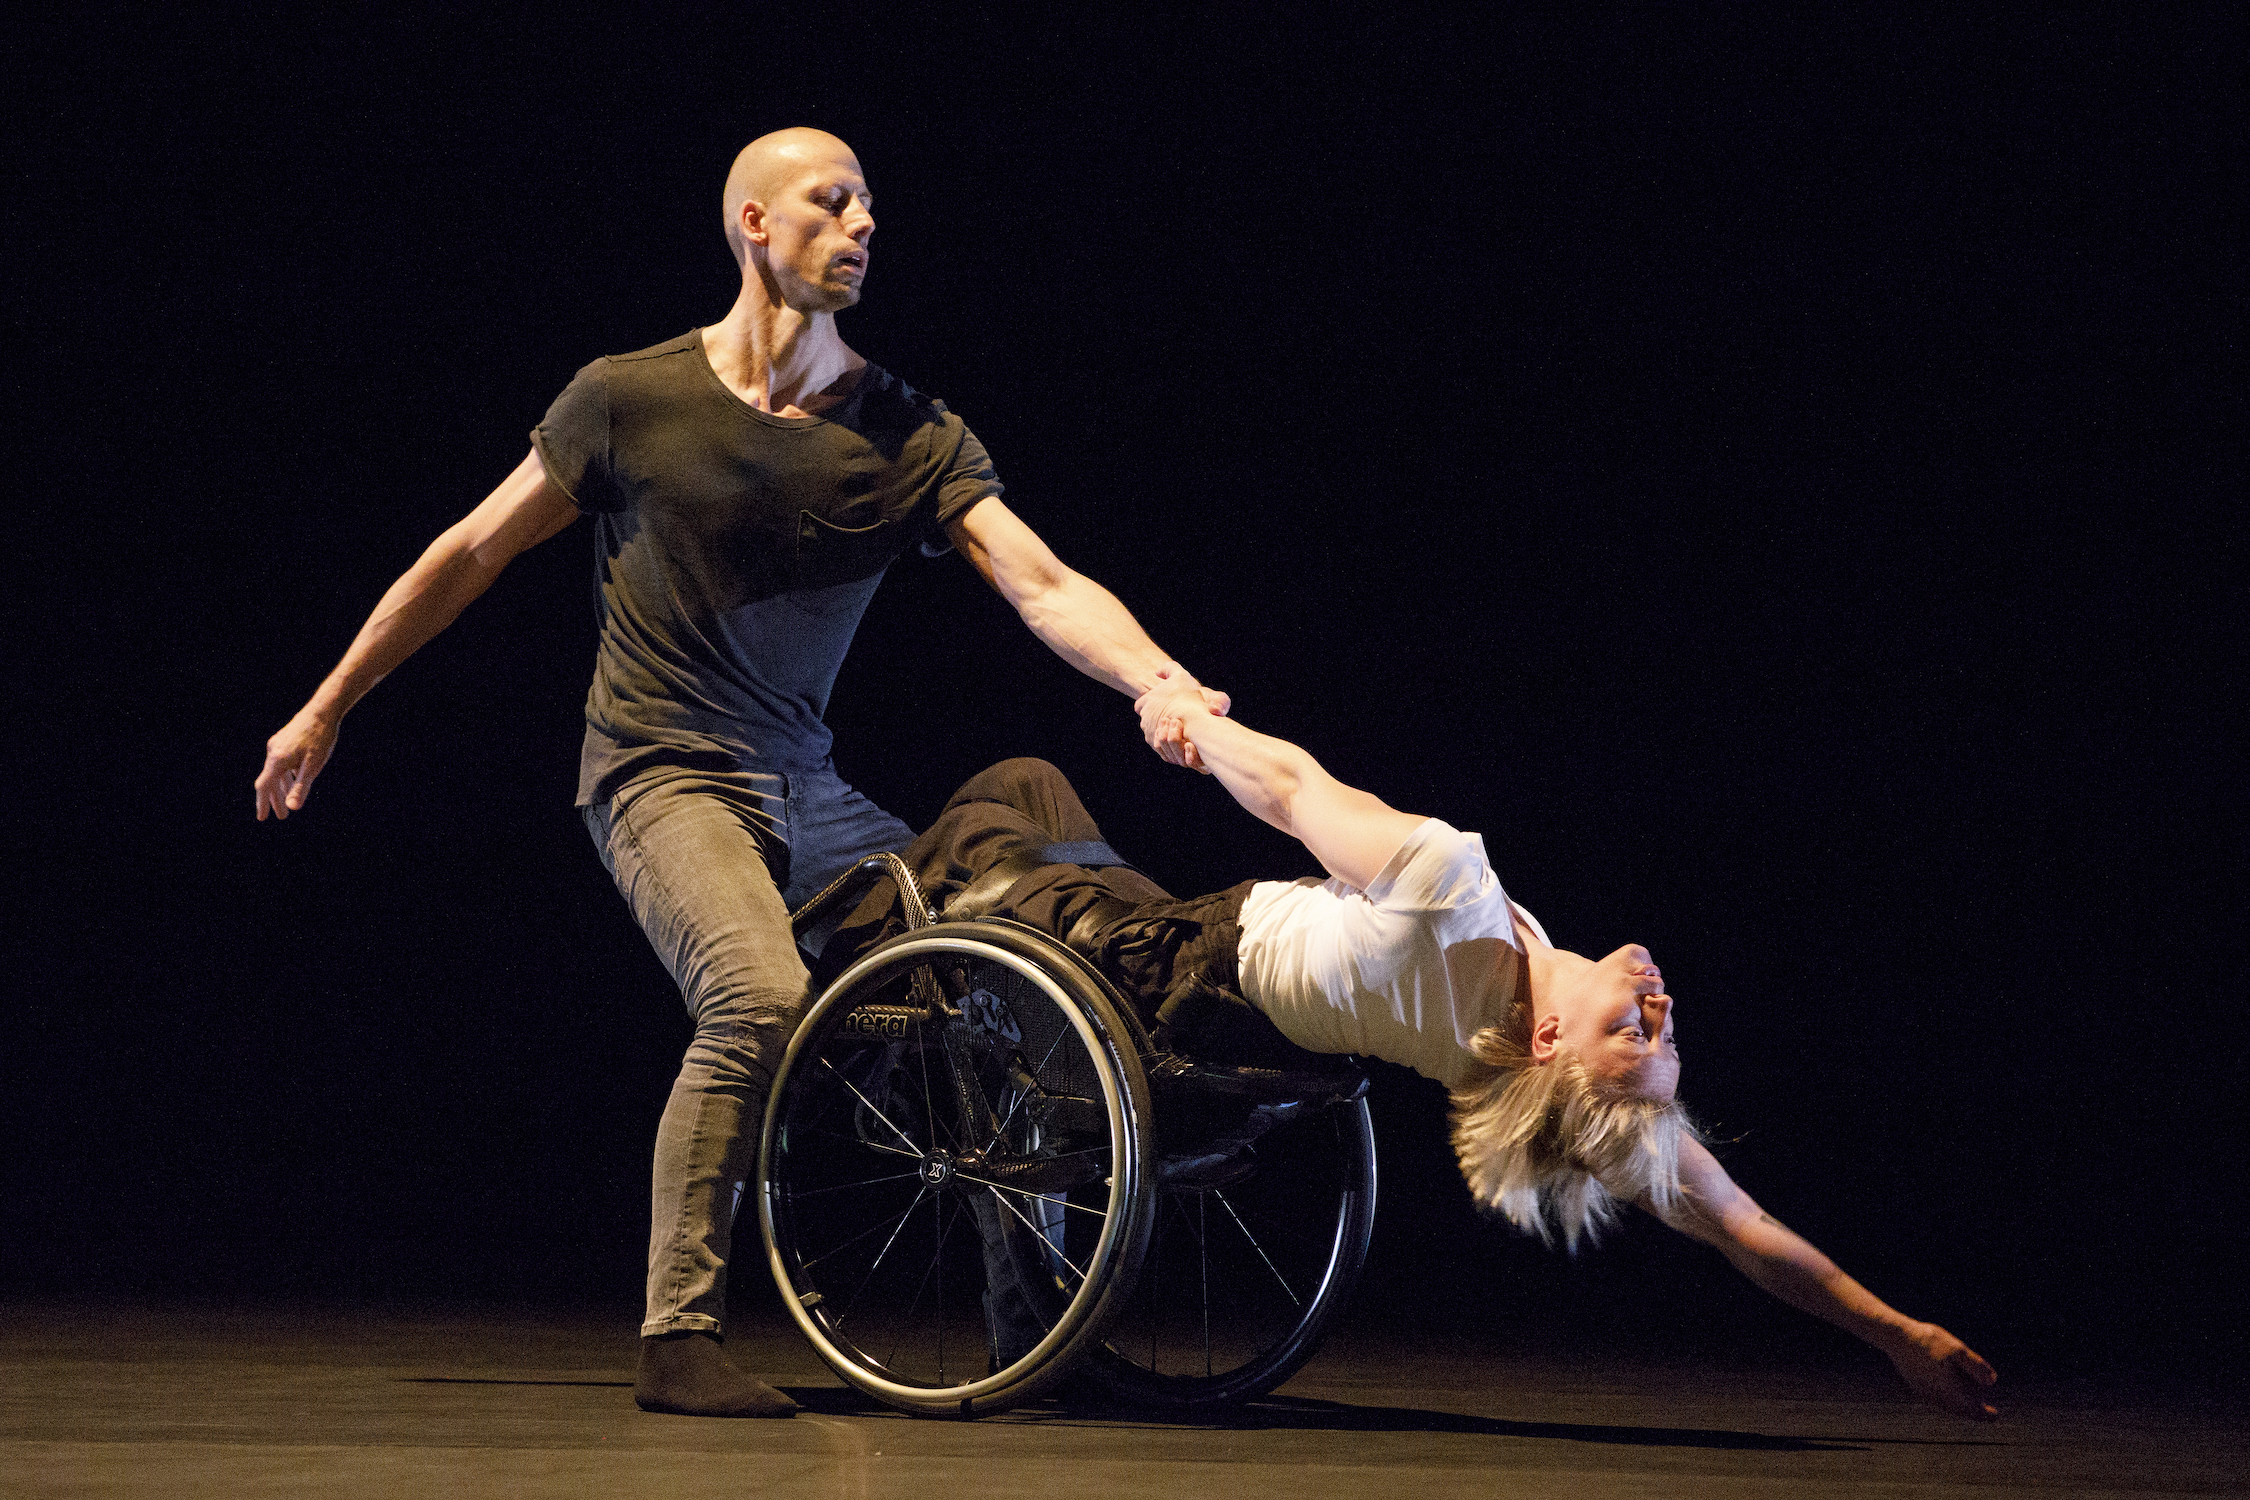 Photo credit: Bruce Zinger from Skanes Dansteater (performers Peder Nilsson and Madeleine Mansson).